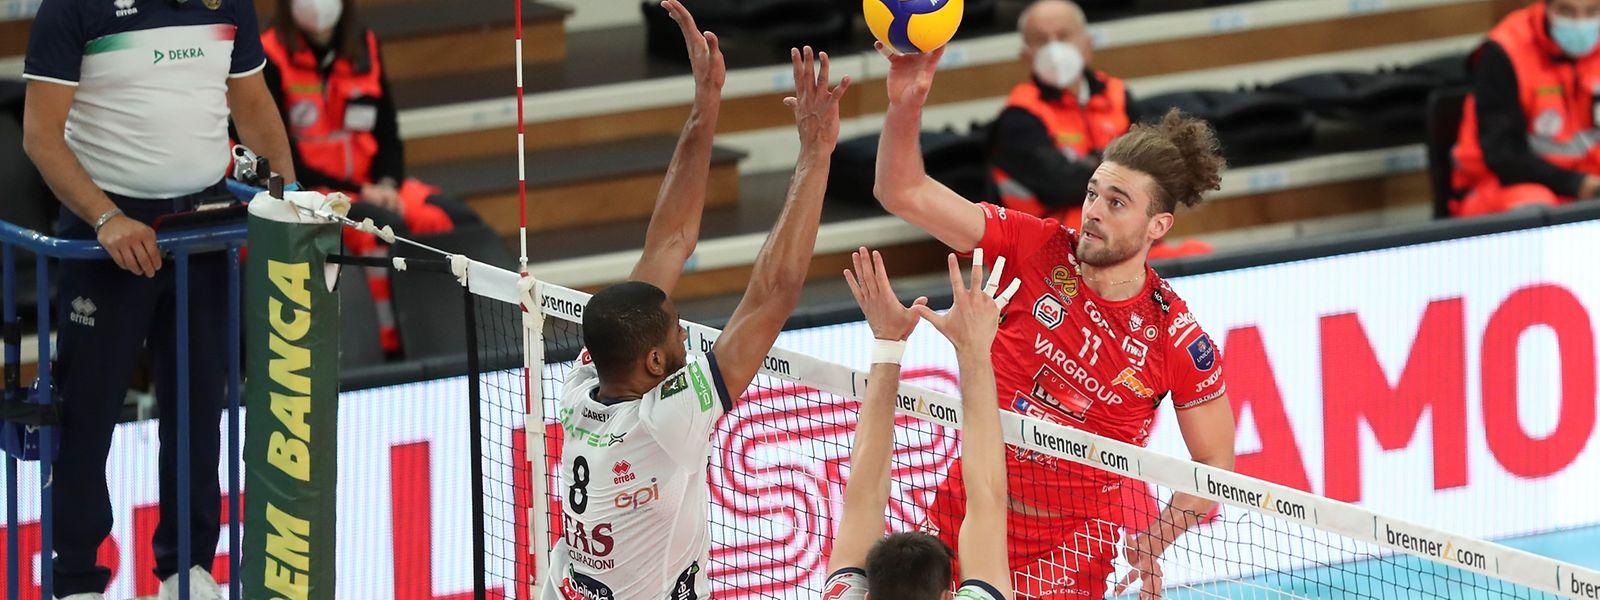 Kamil Rychlicki erzielt 13 Punkte.